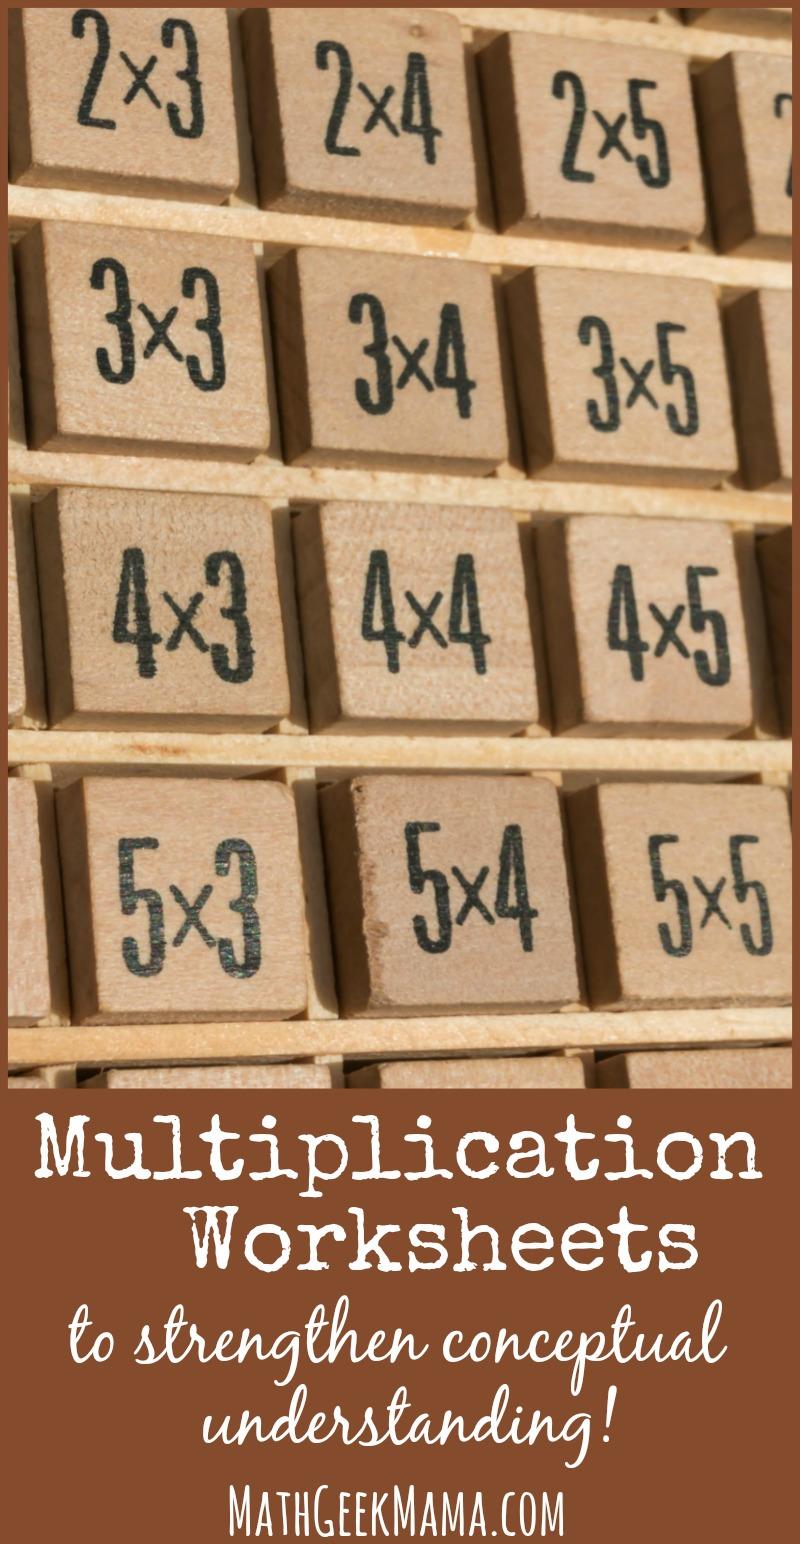 medium resolution of Fun Multiplication Worksheets that Build Conceptual Understanding